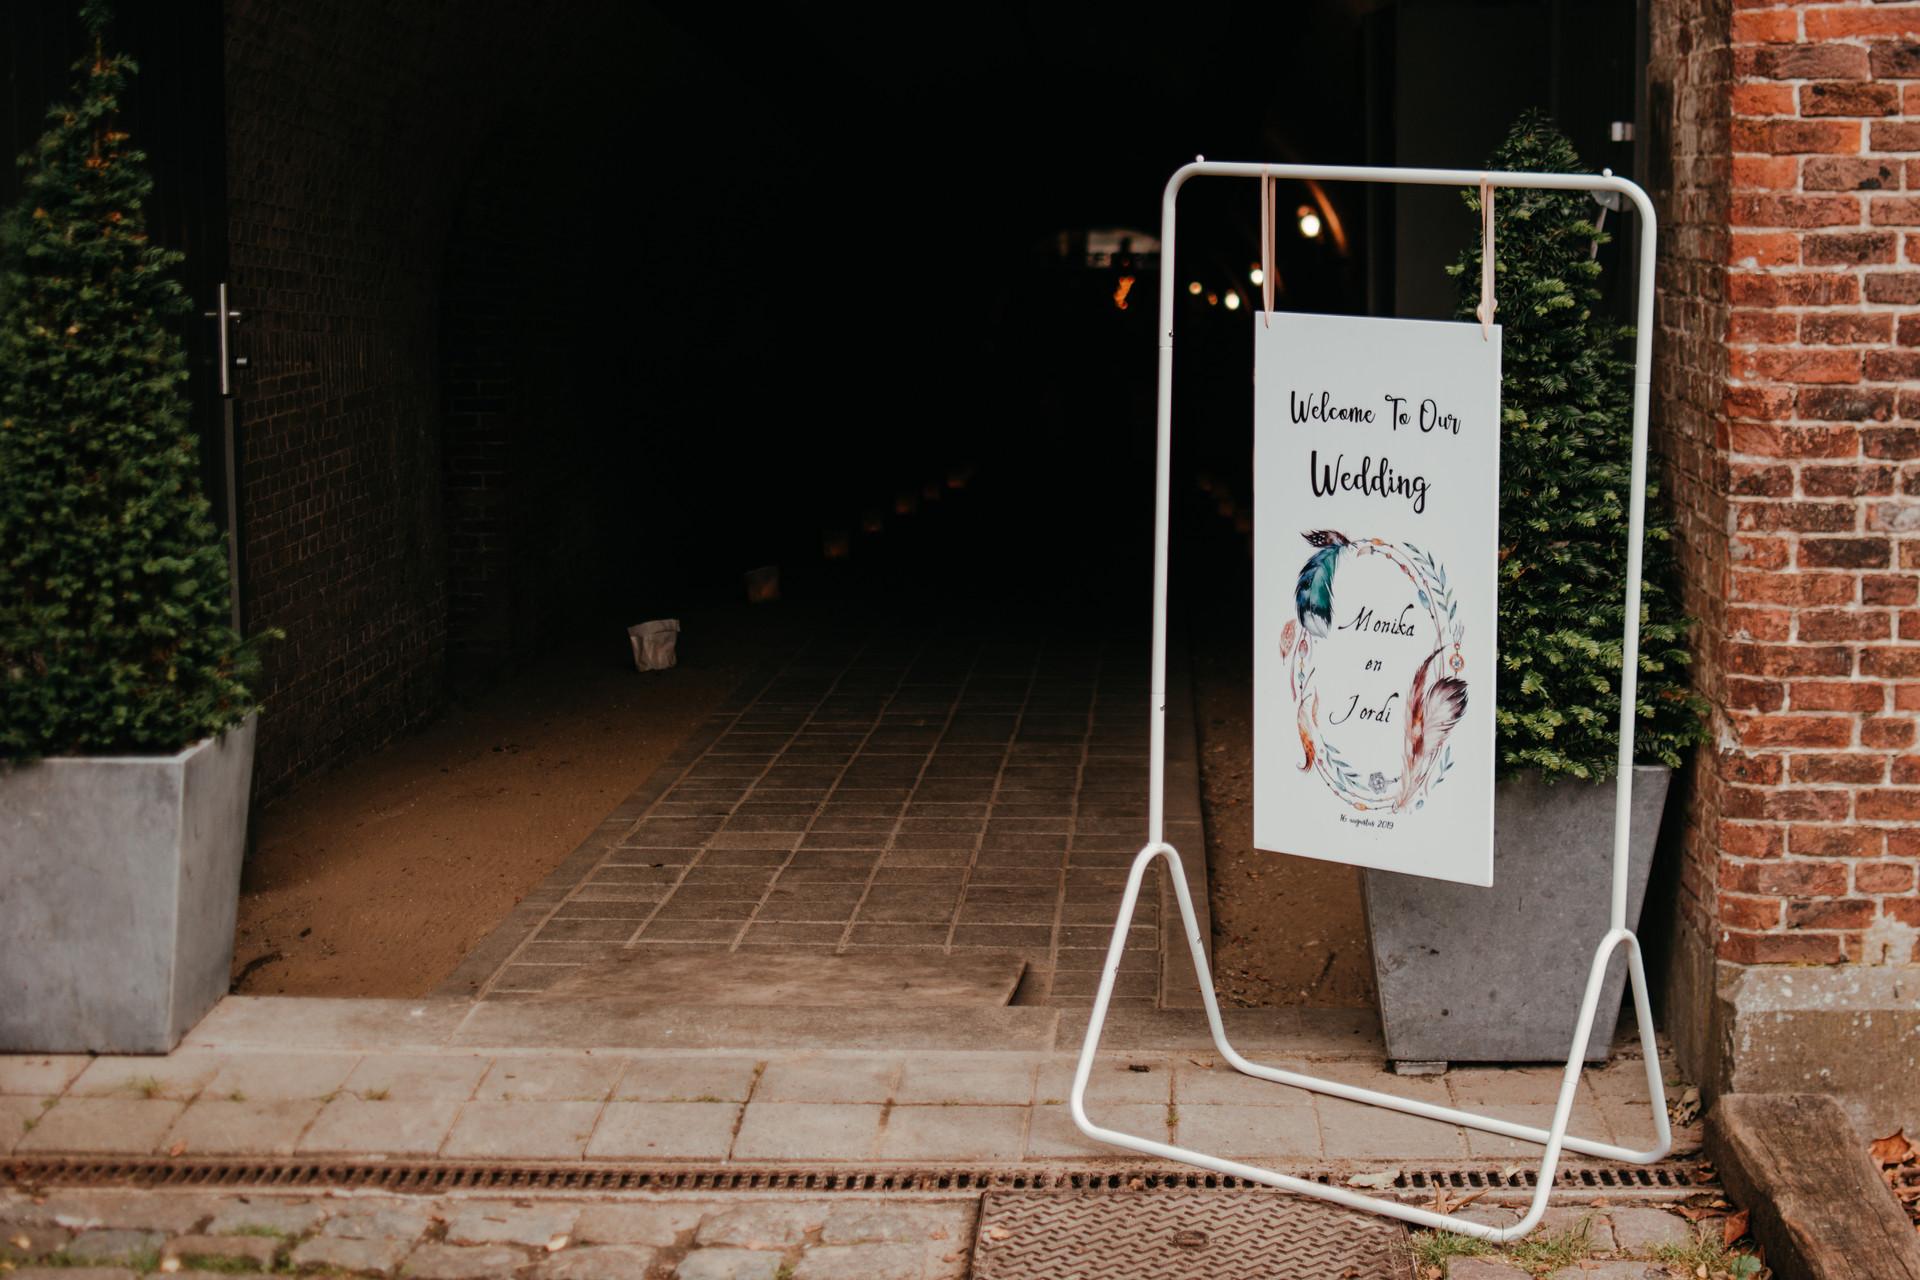 Huwelijk-Monika&Jordi-35.jpg